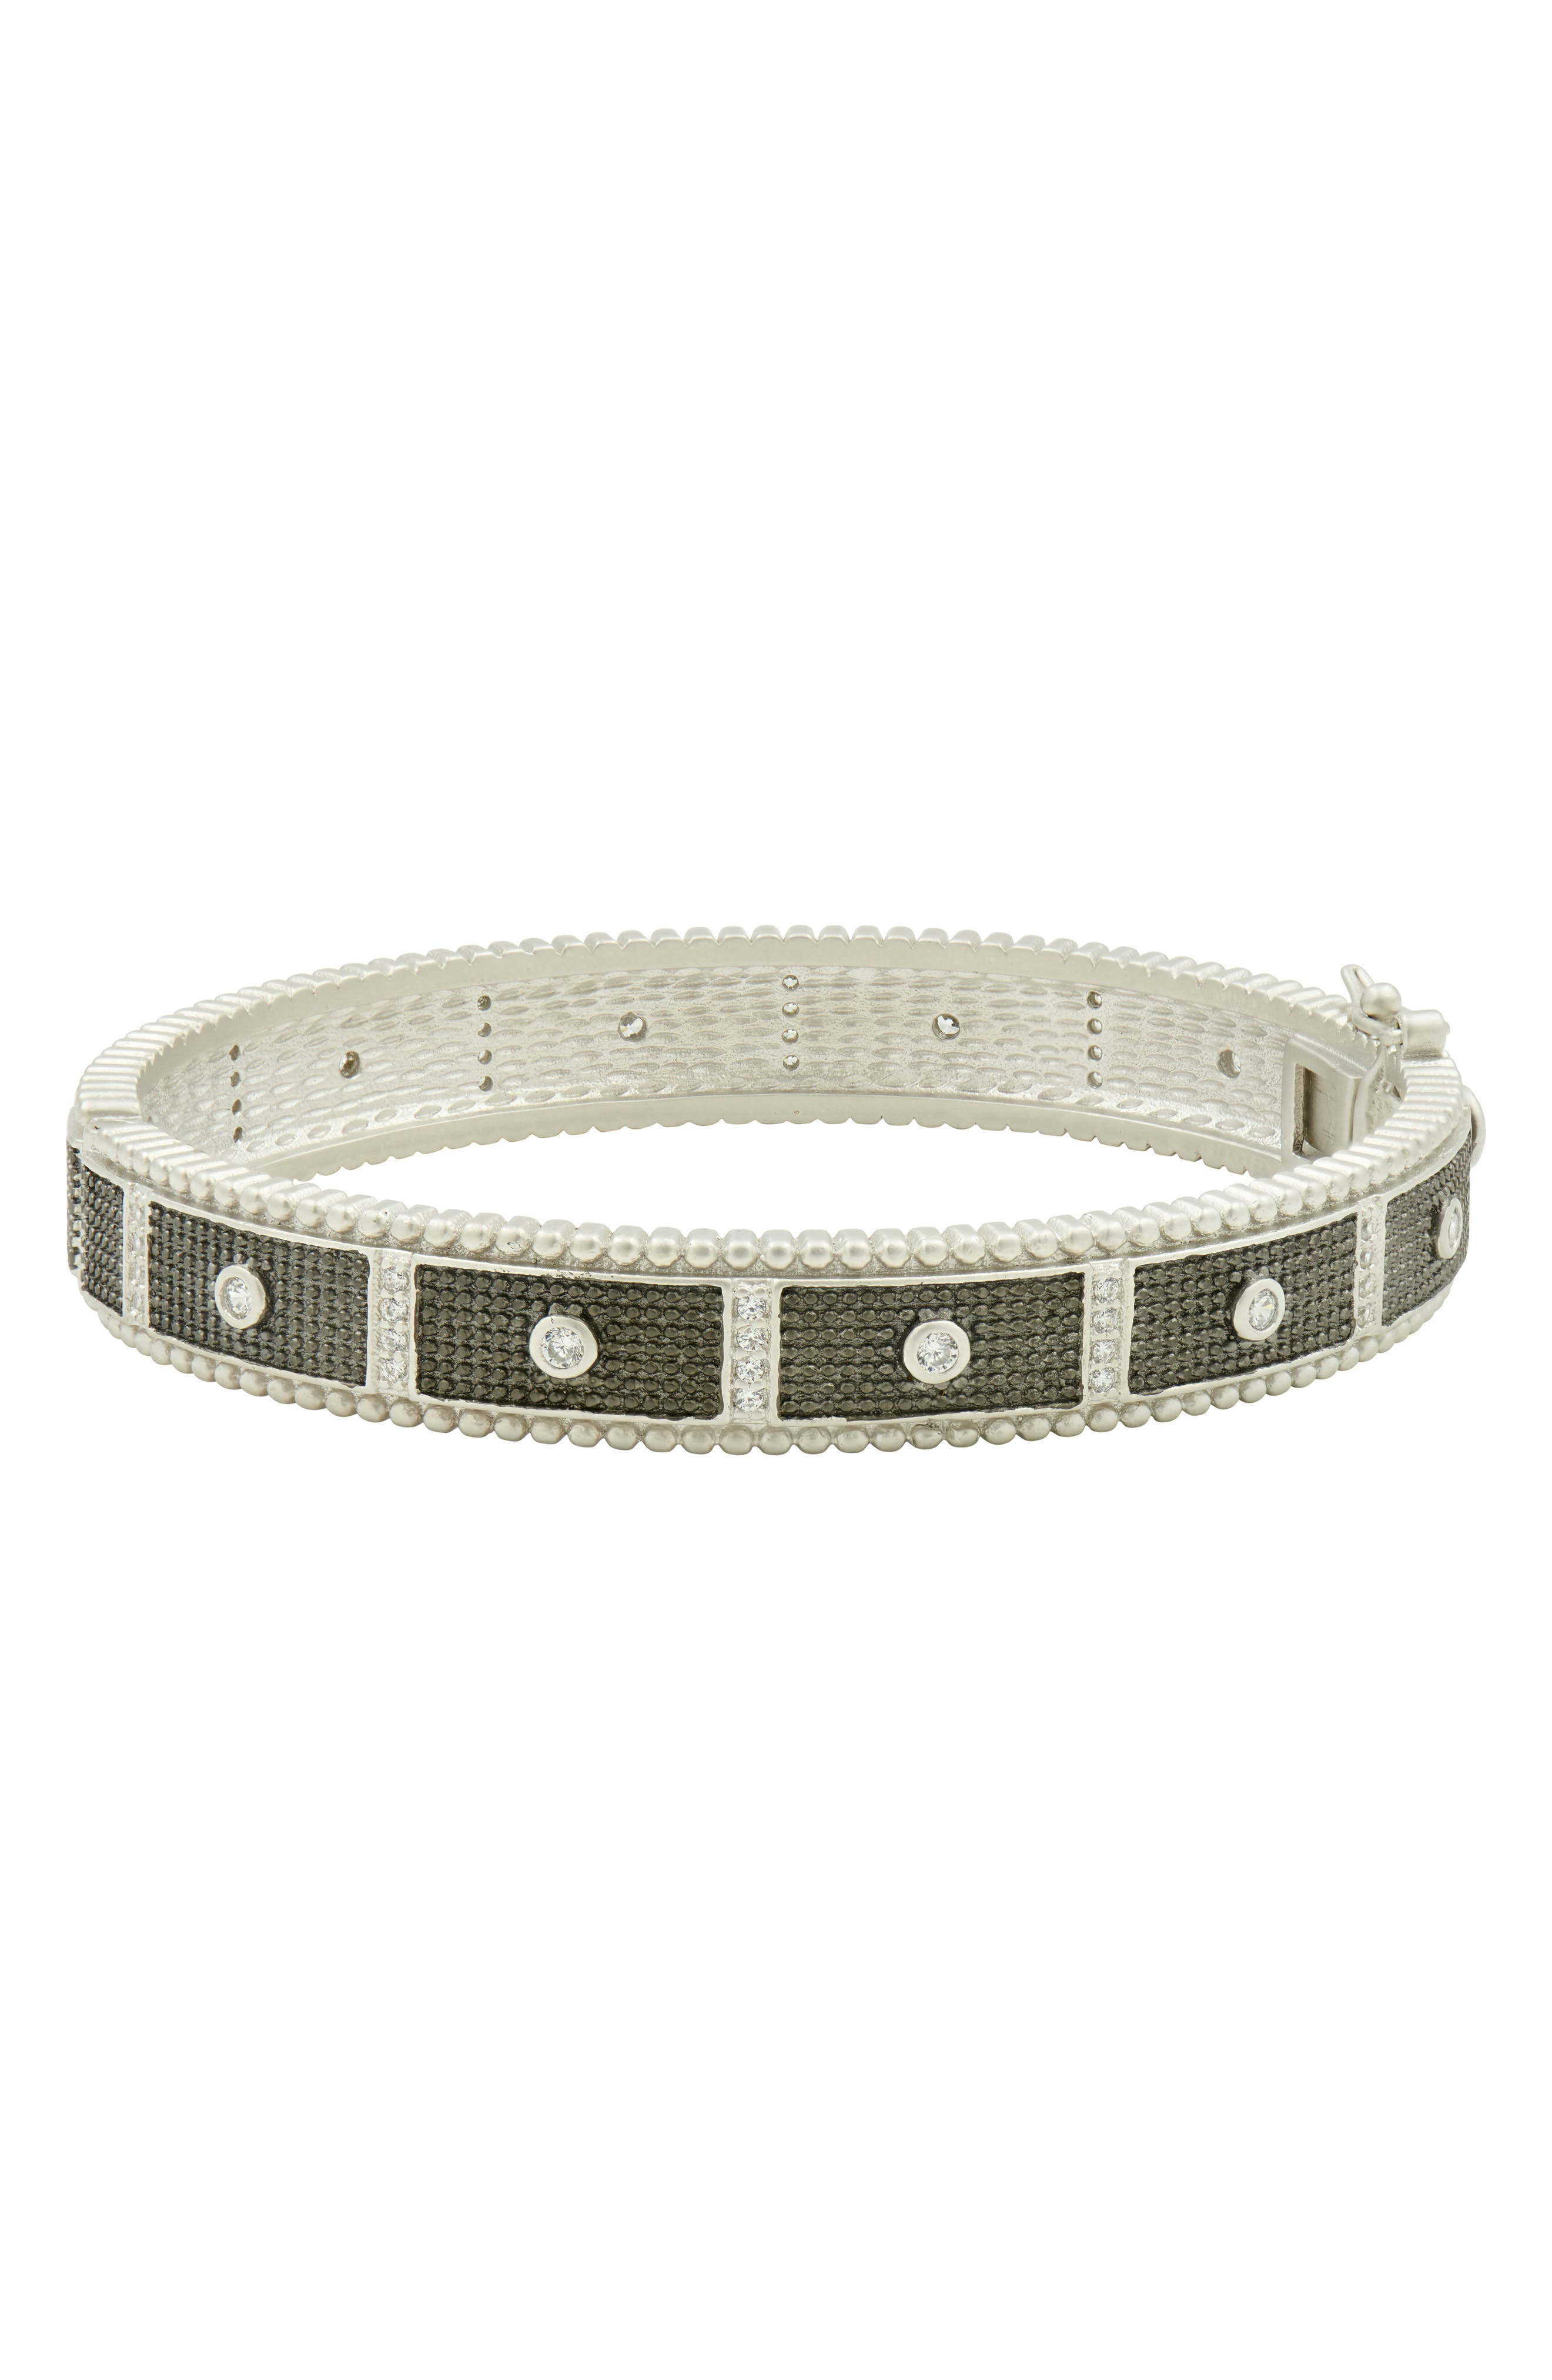 Industrial Finish Bezel Bar Cuff Bracelet,                         Main,                         color, Silver/ Black Rhodium